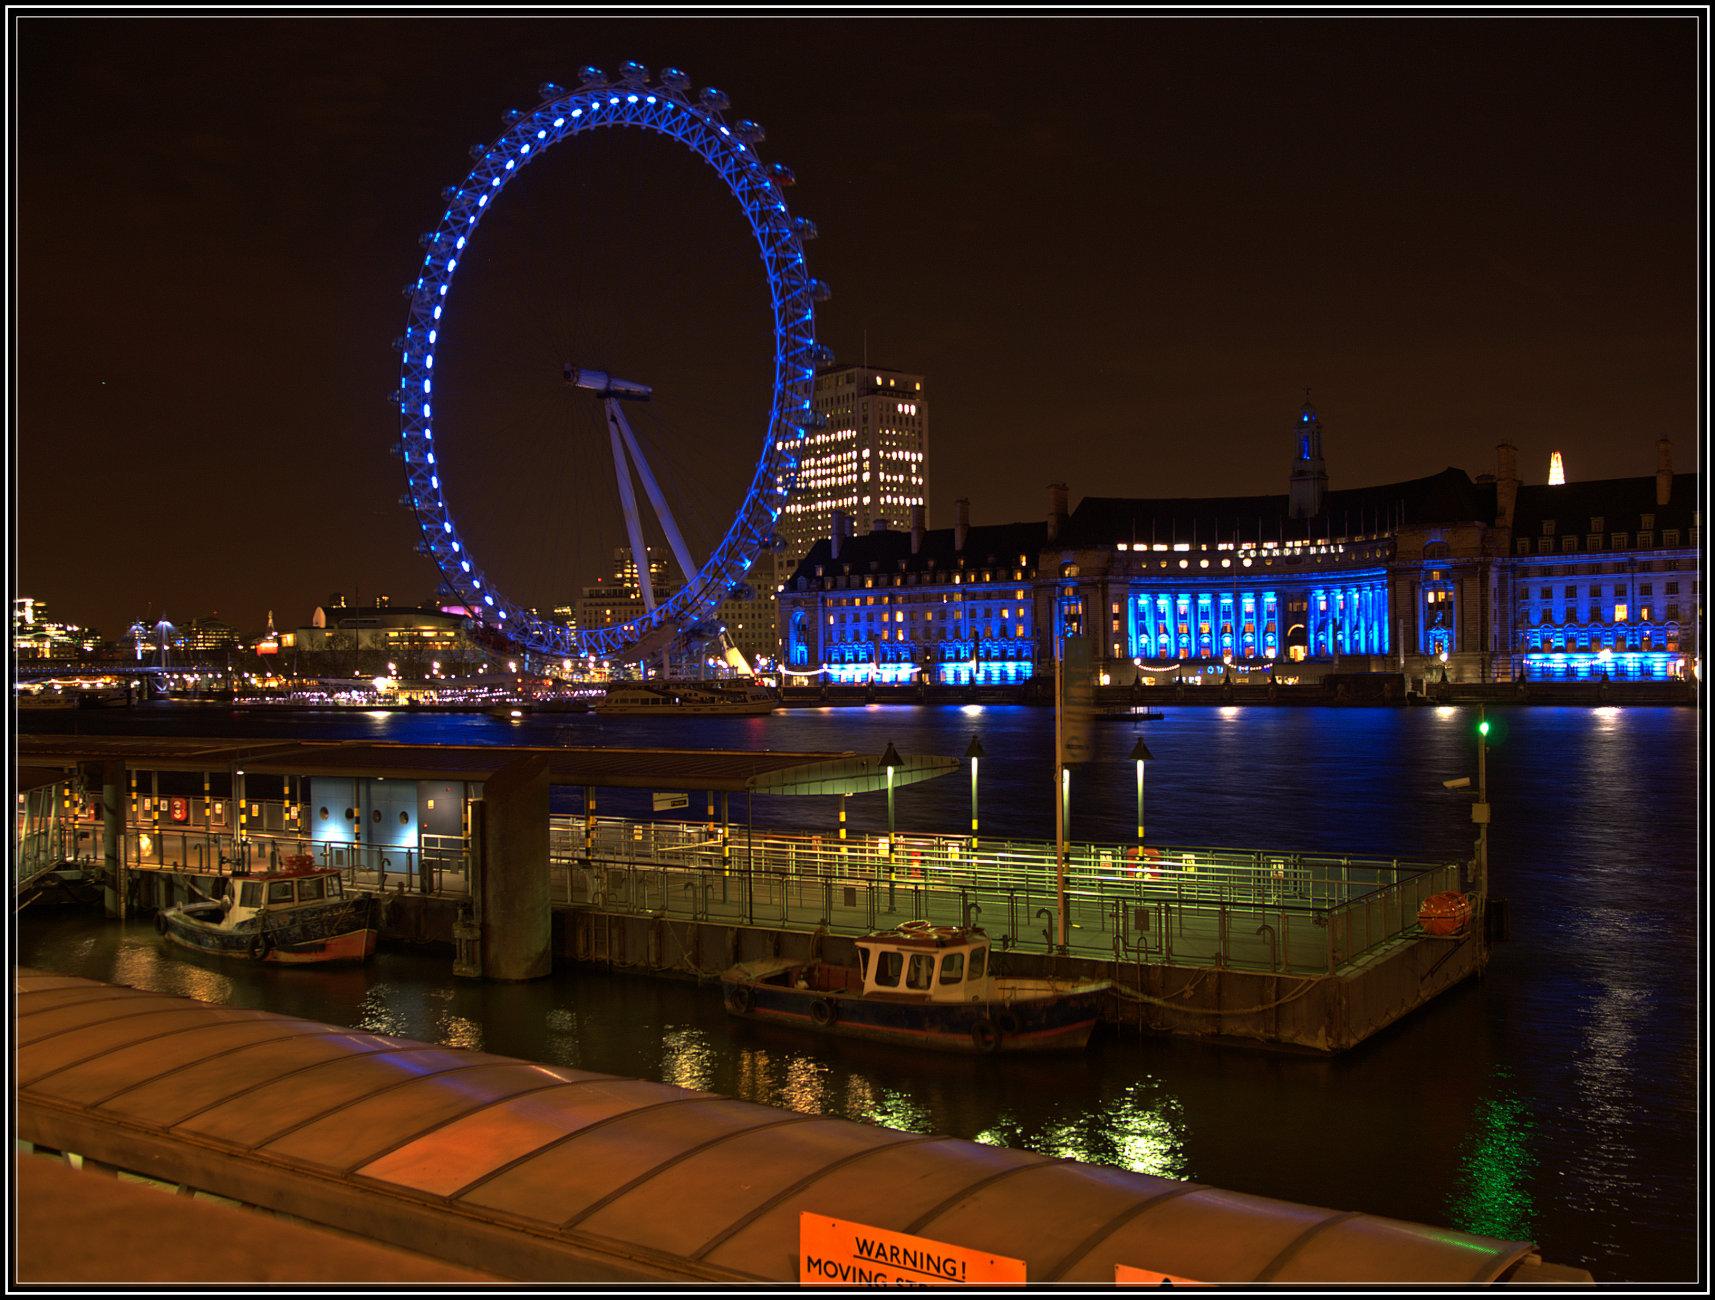 London Eye @ f2.8